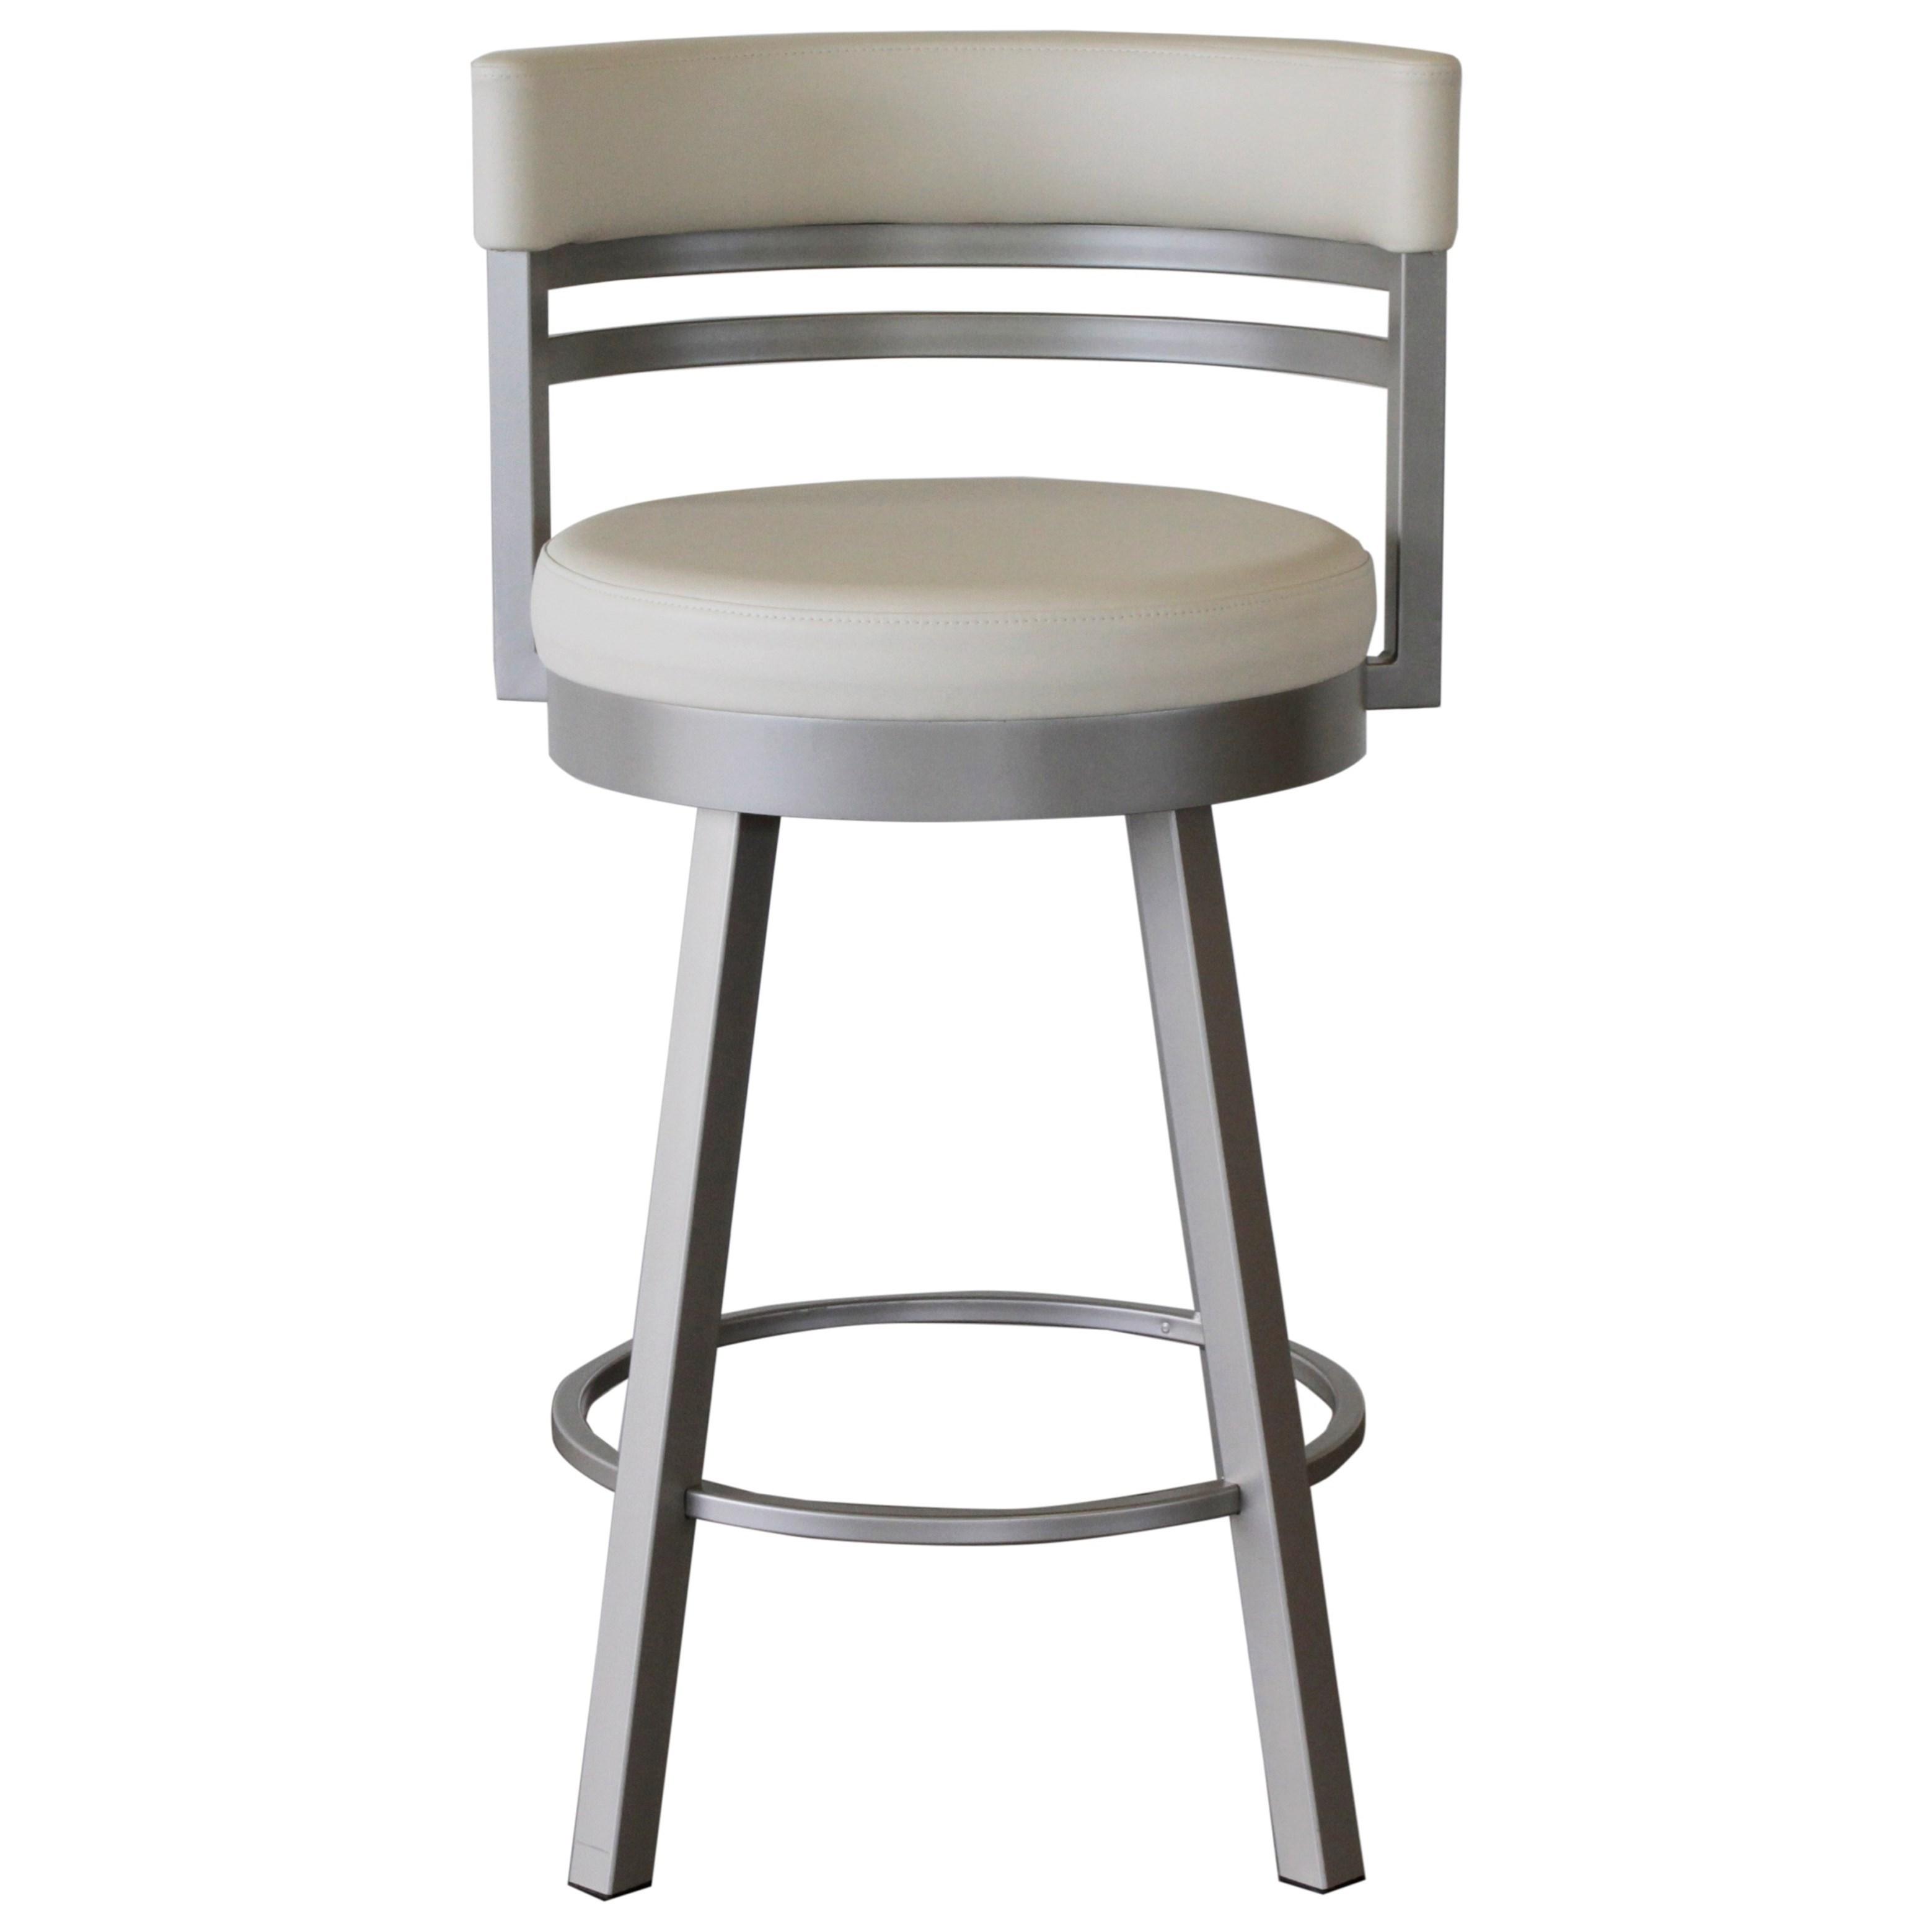 Urban Swivel Stool by Amisco at HomeWorld Furniture